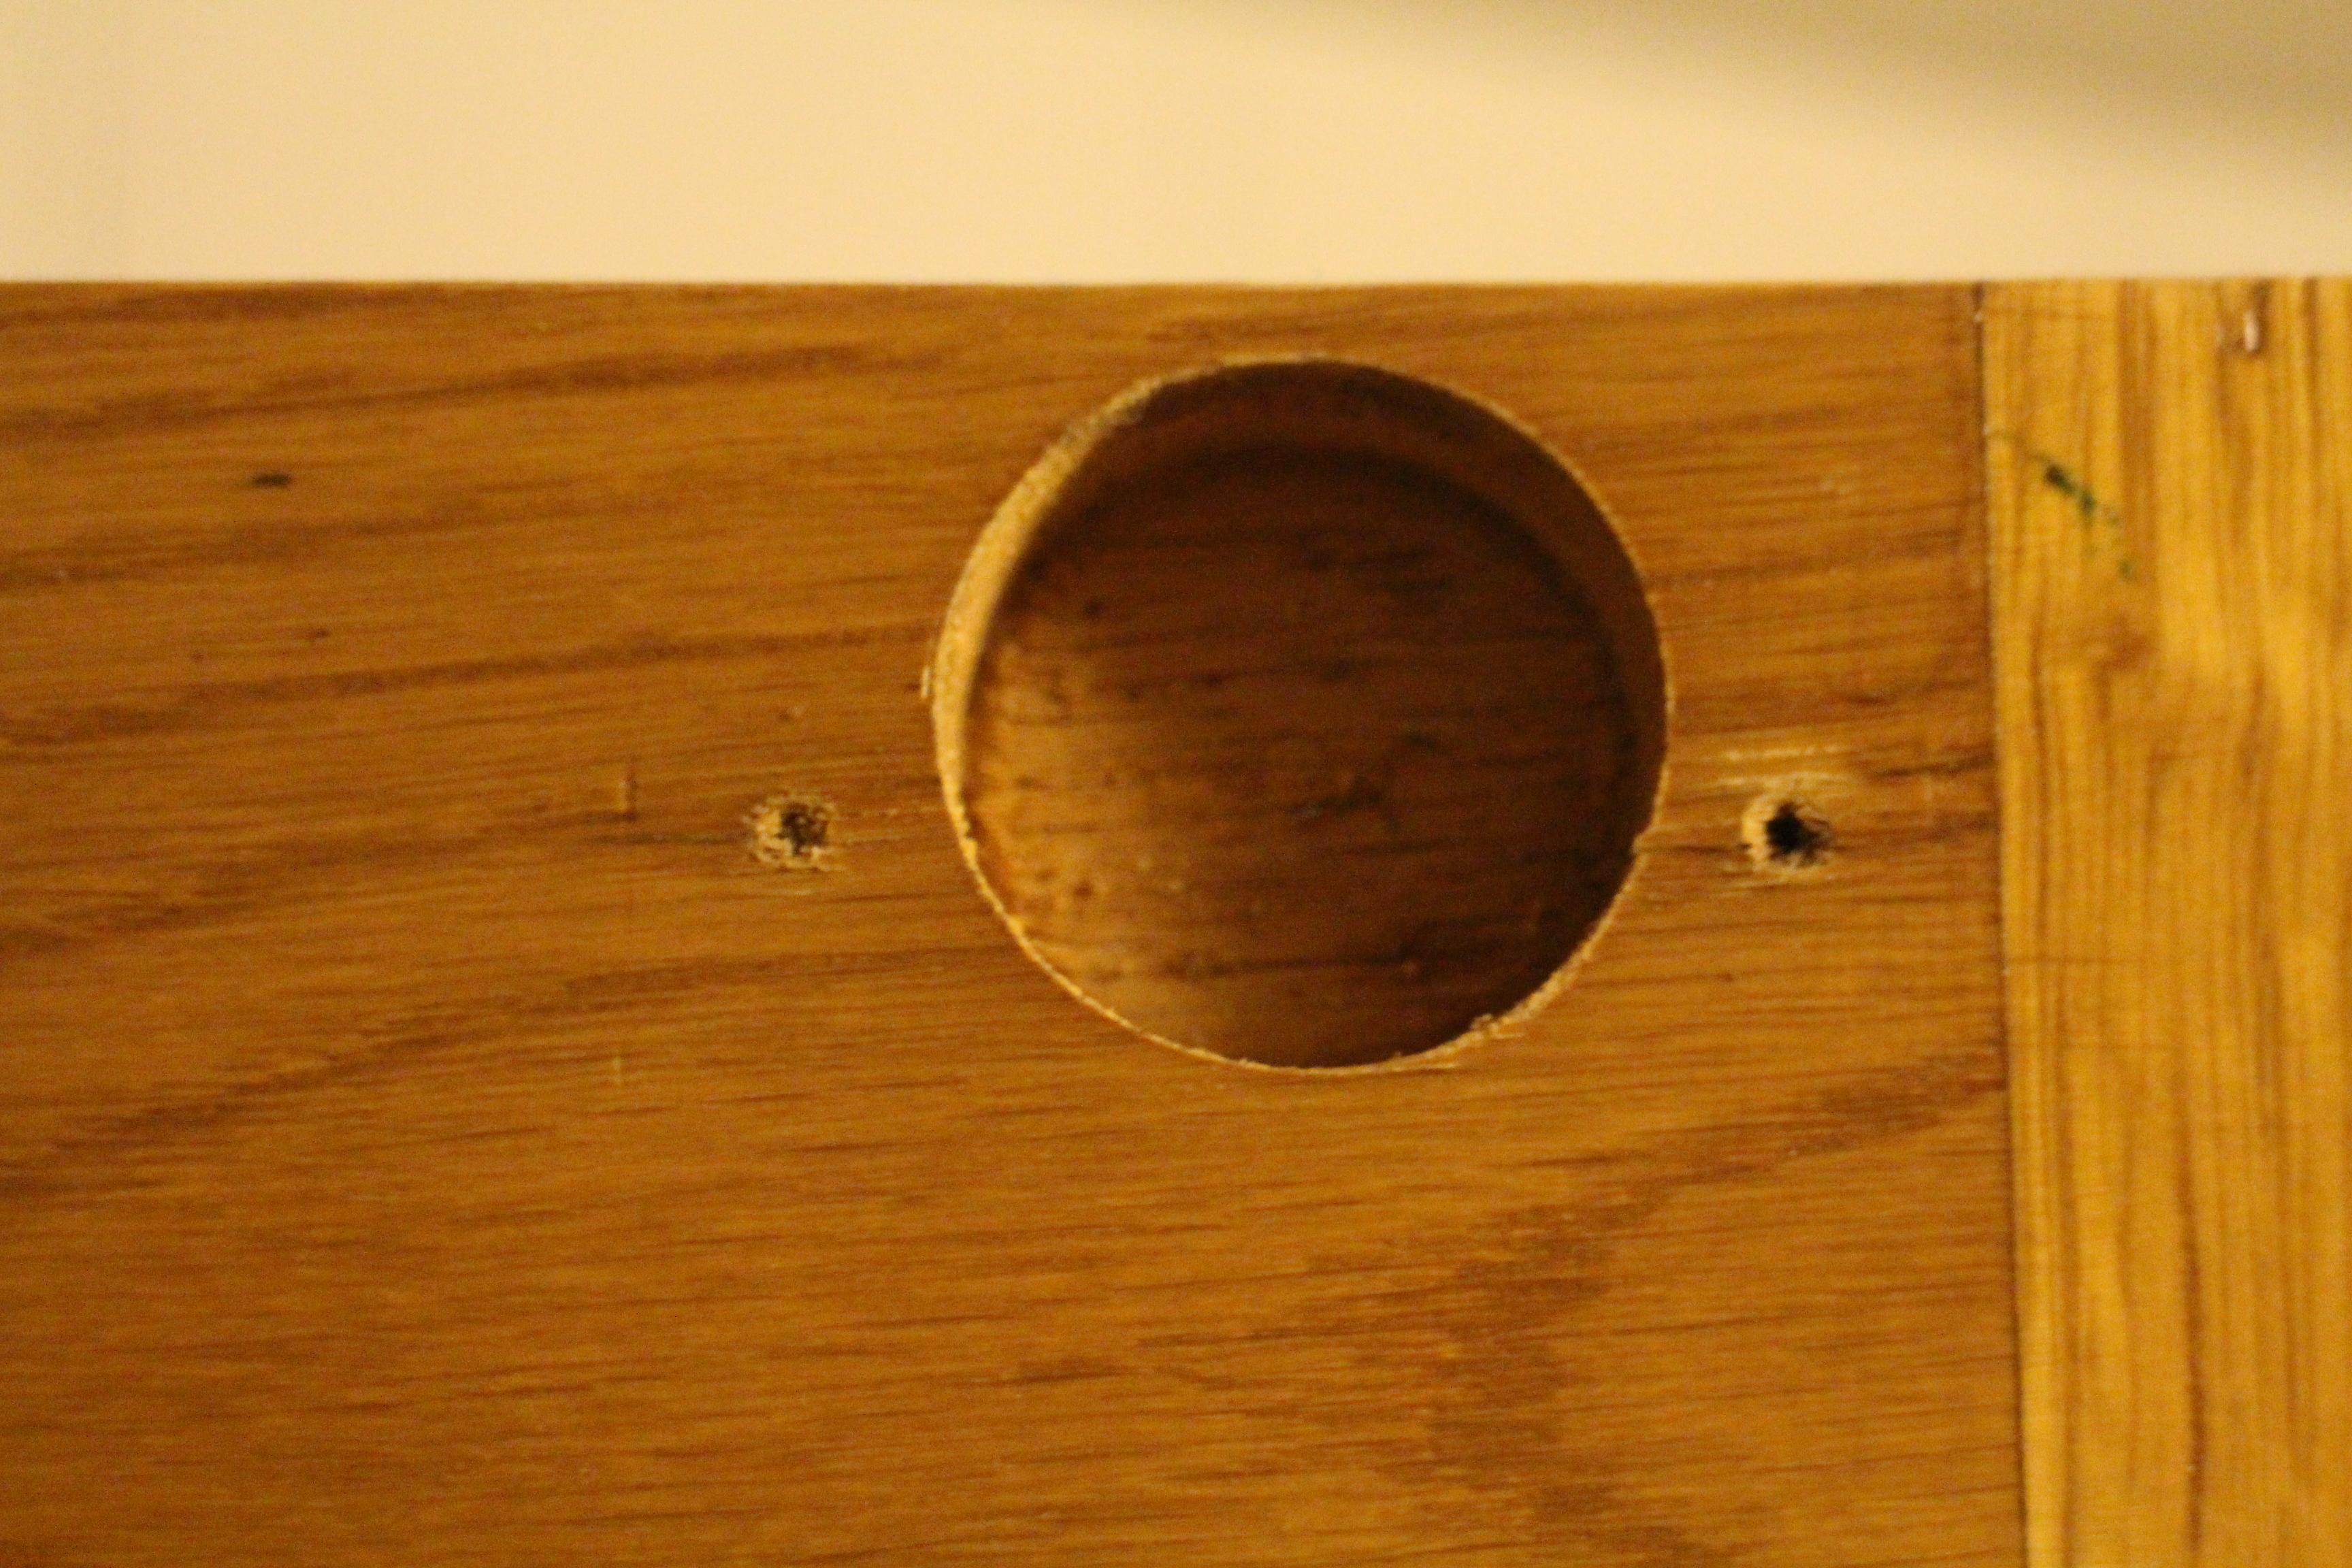 File:Concealed hinge hole.JPG - Wikimedia Commons